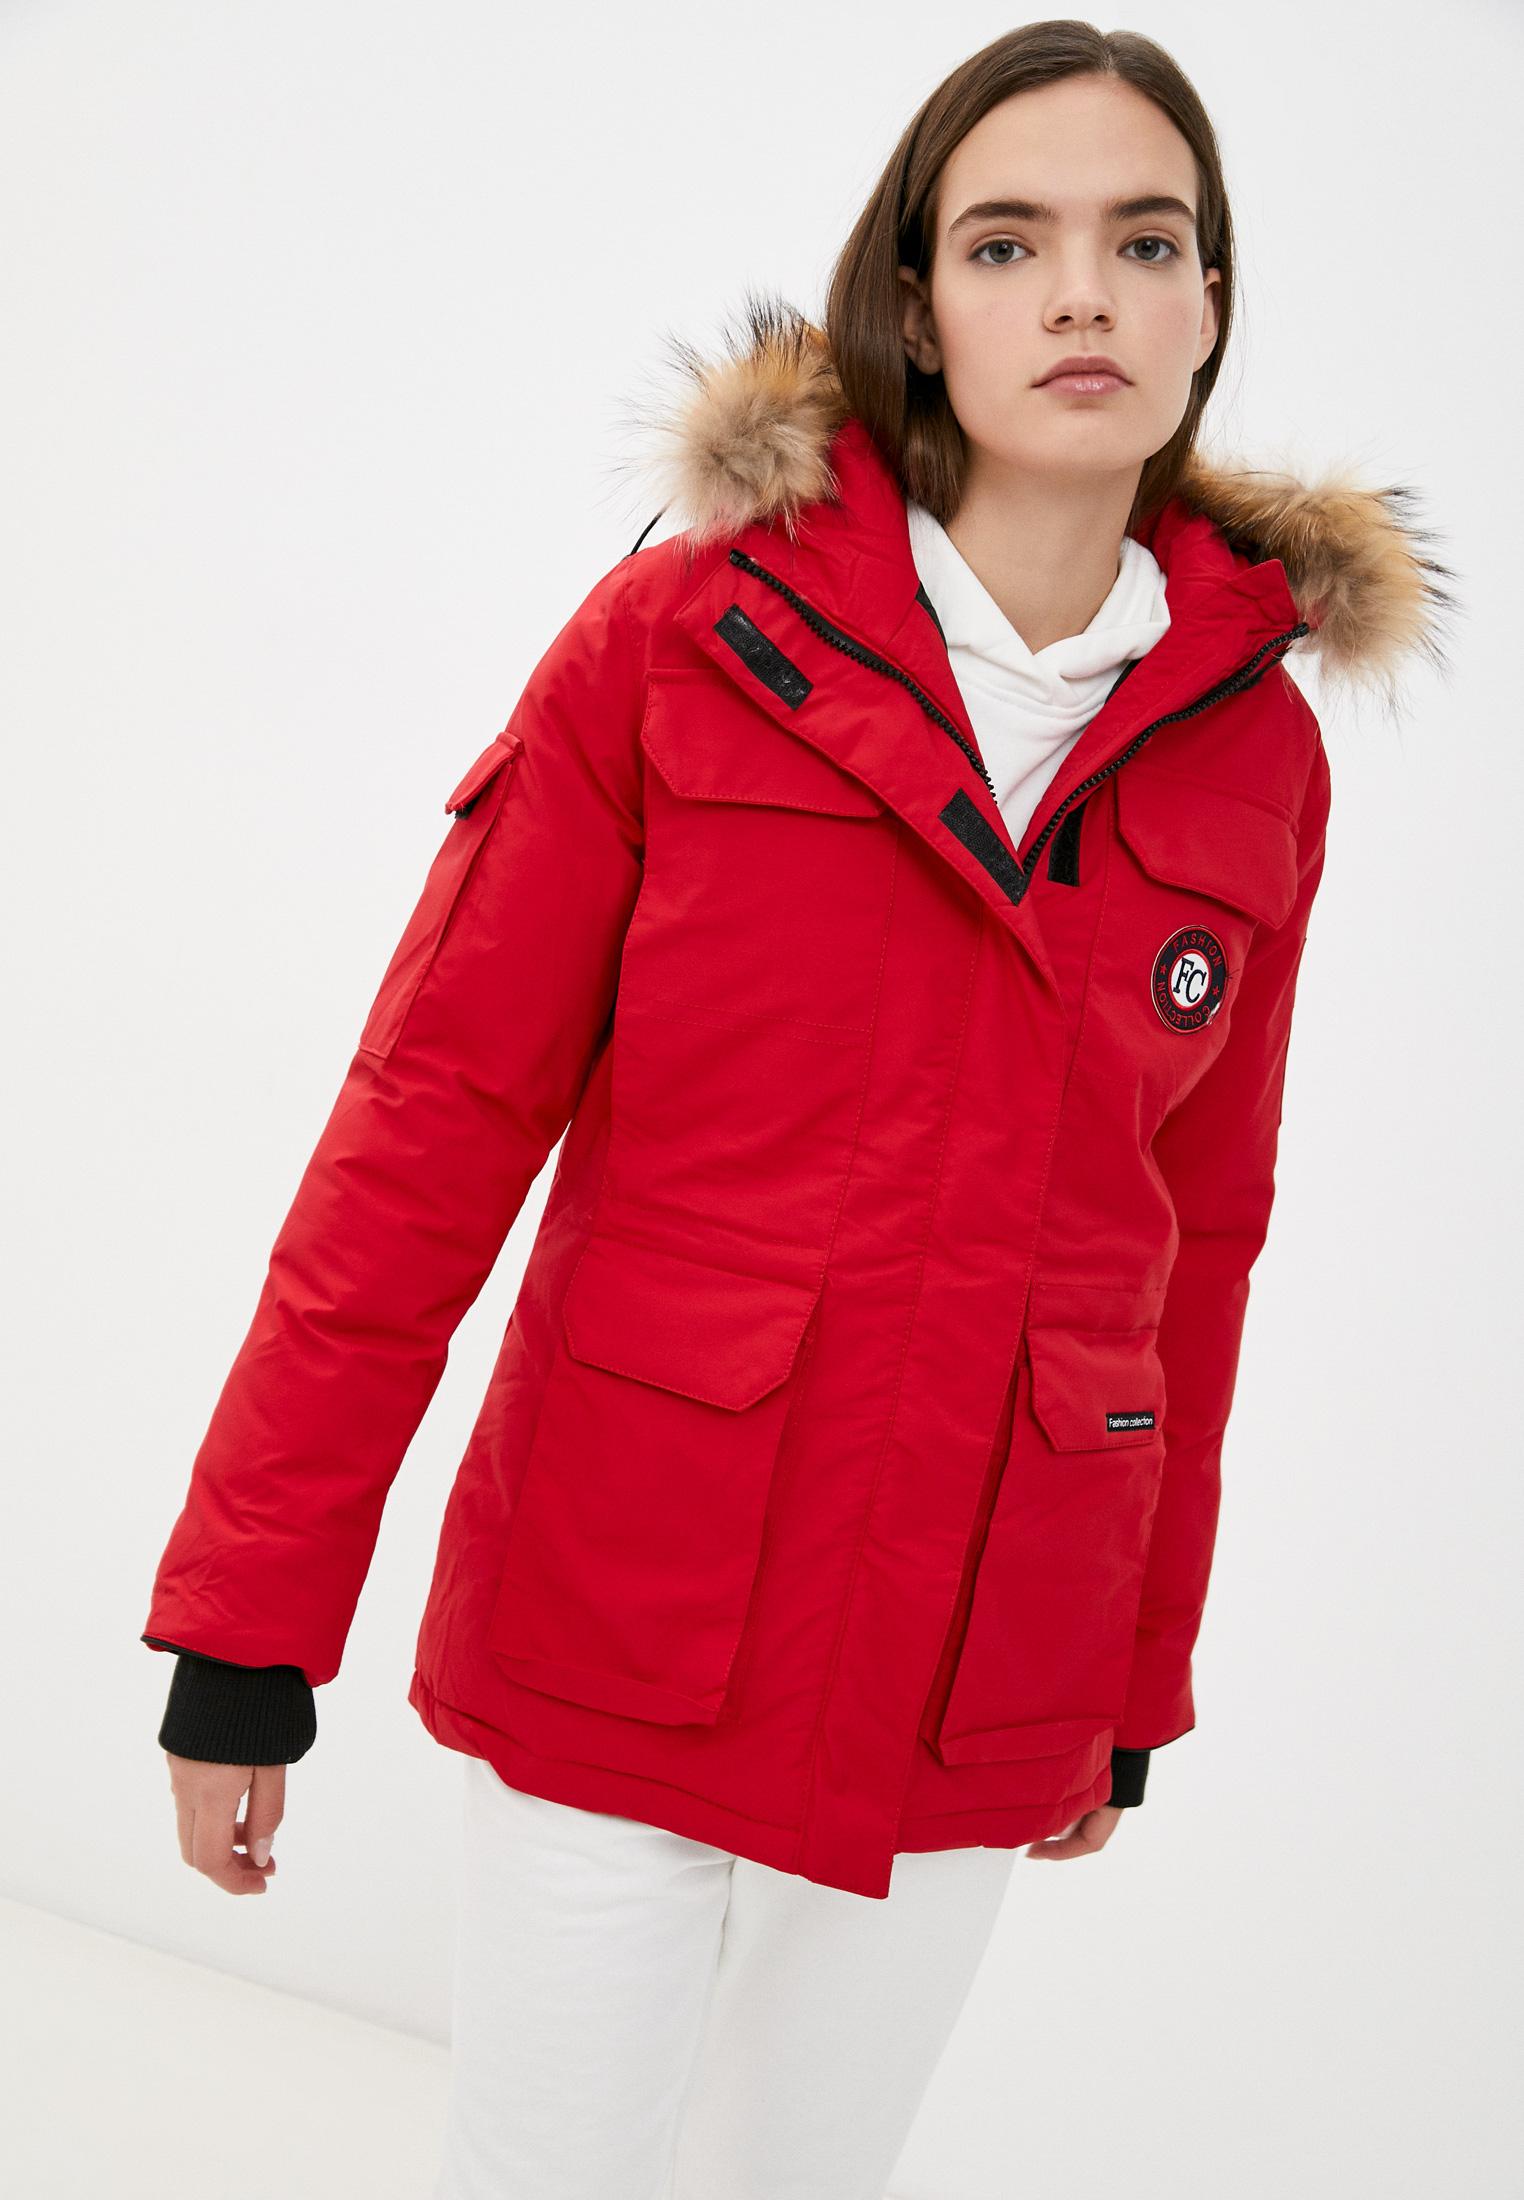 Утепленная куртка Macleria Куртка утепленная Macleria